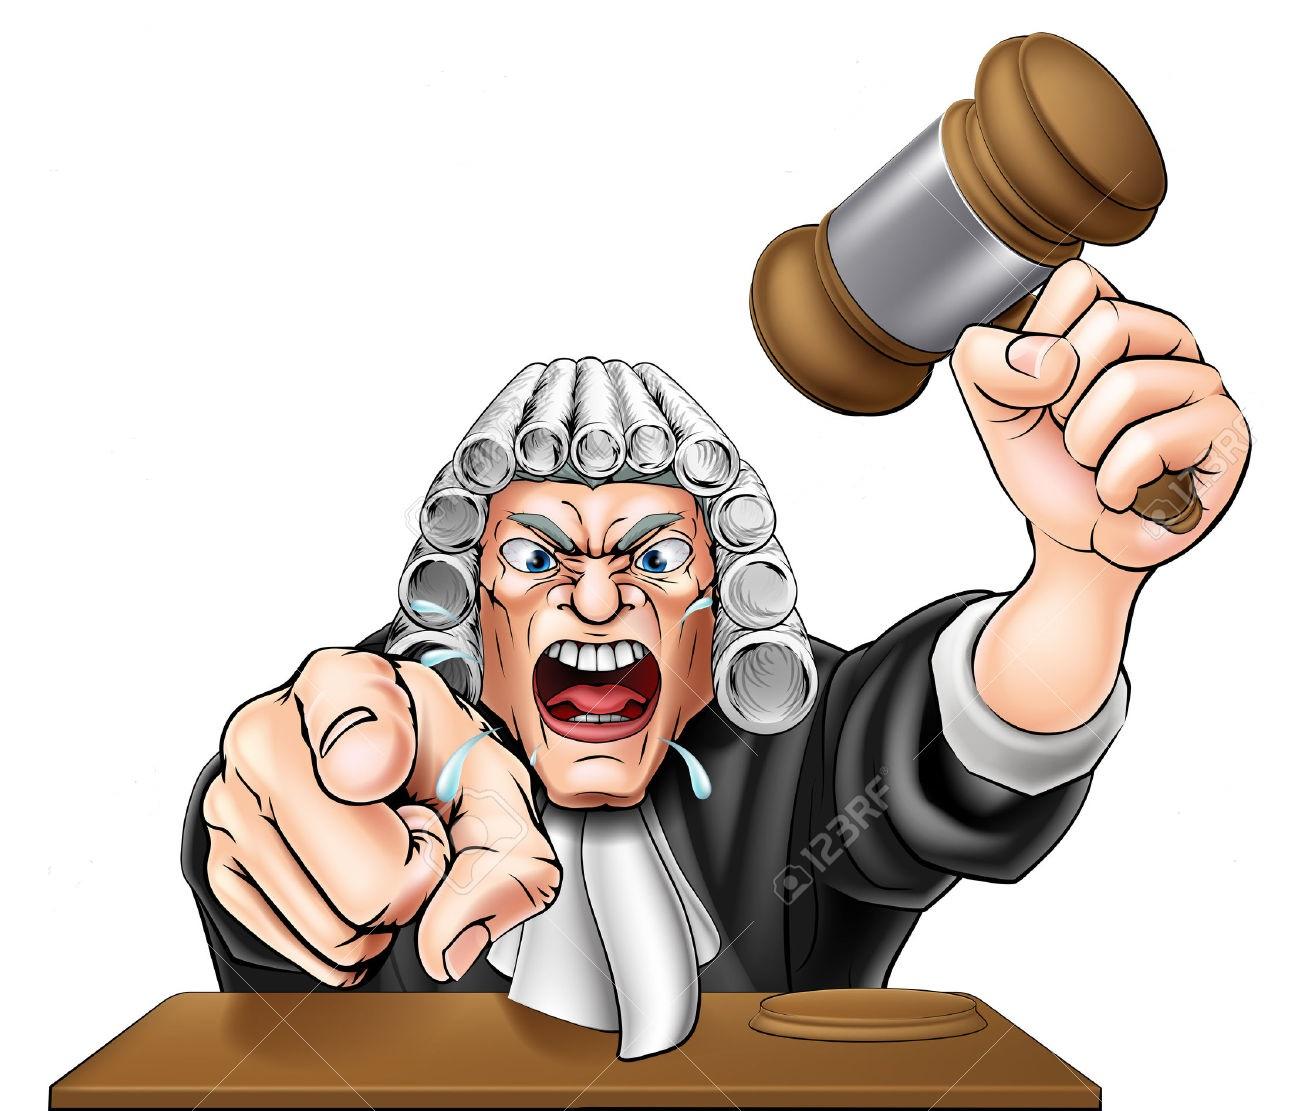 P_Judge_Angry.jpg